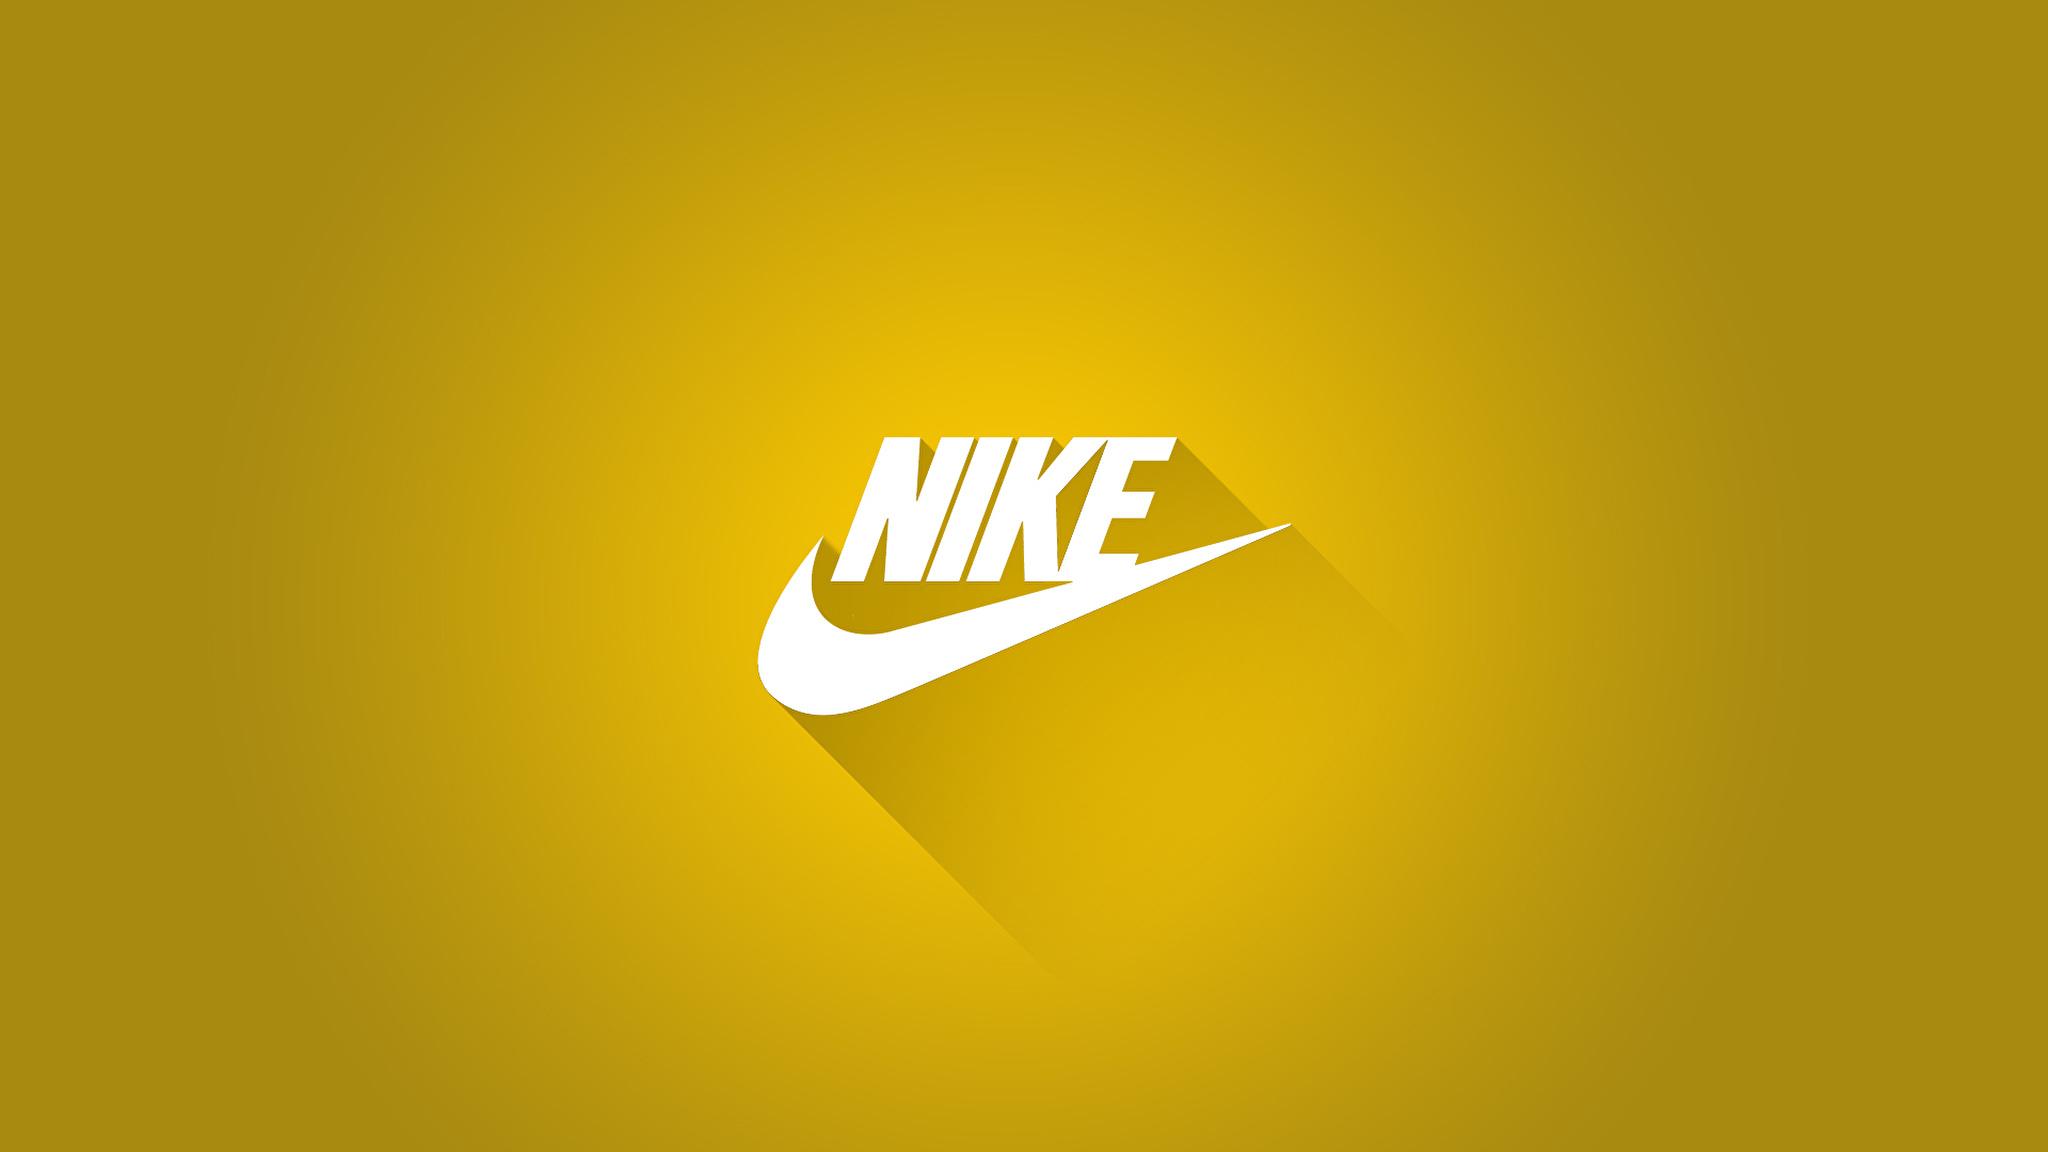 bf2591d6 Фотография Логотип эмблема Nike 2048x1152